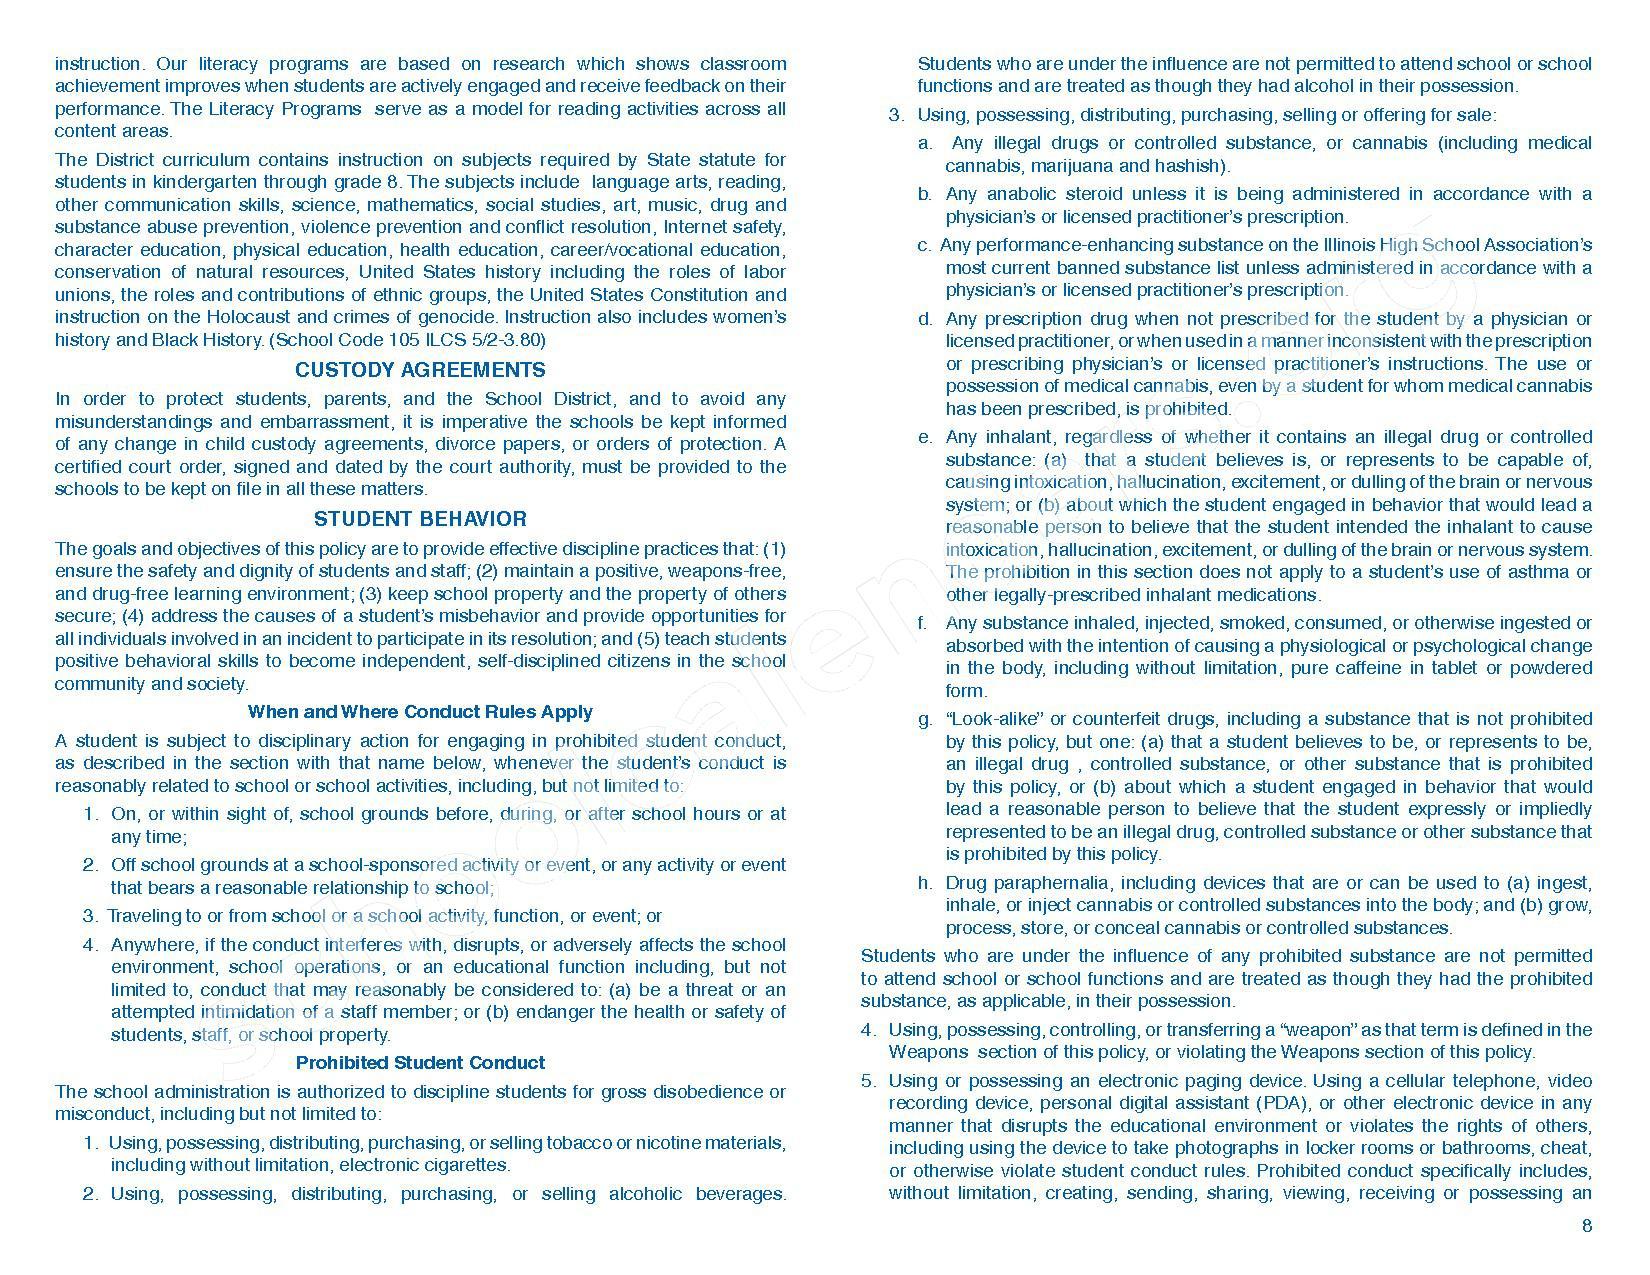 2016 - 2017 Parent/Student Handbook – Roosevelt Elementary School – page 12